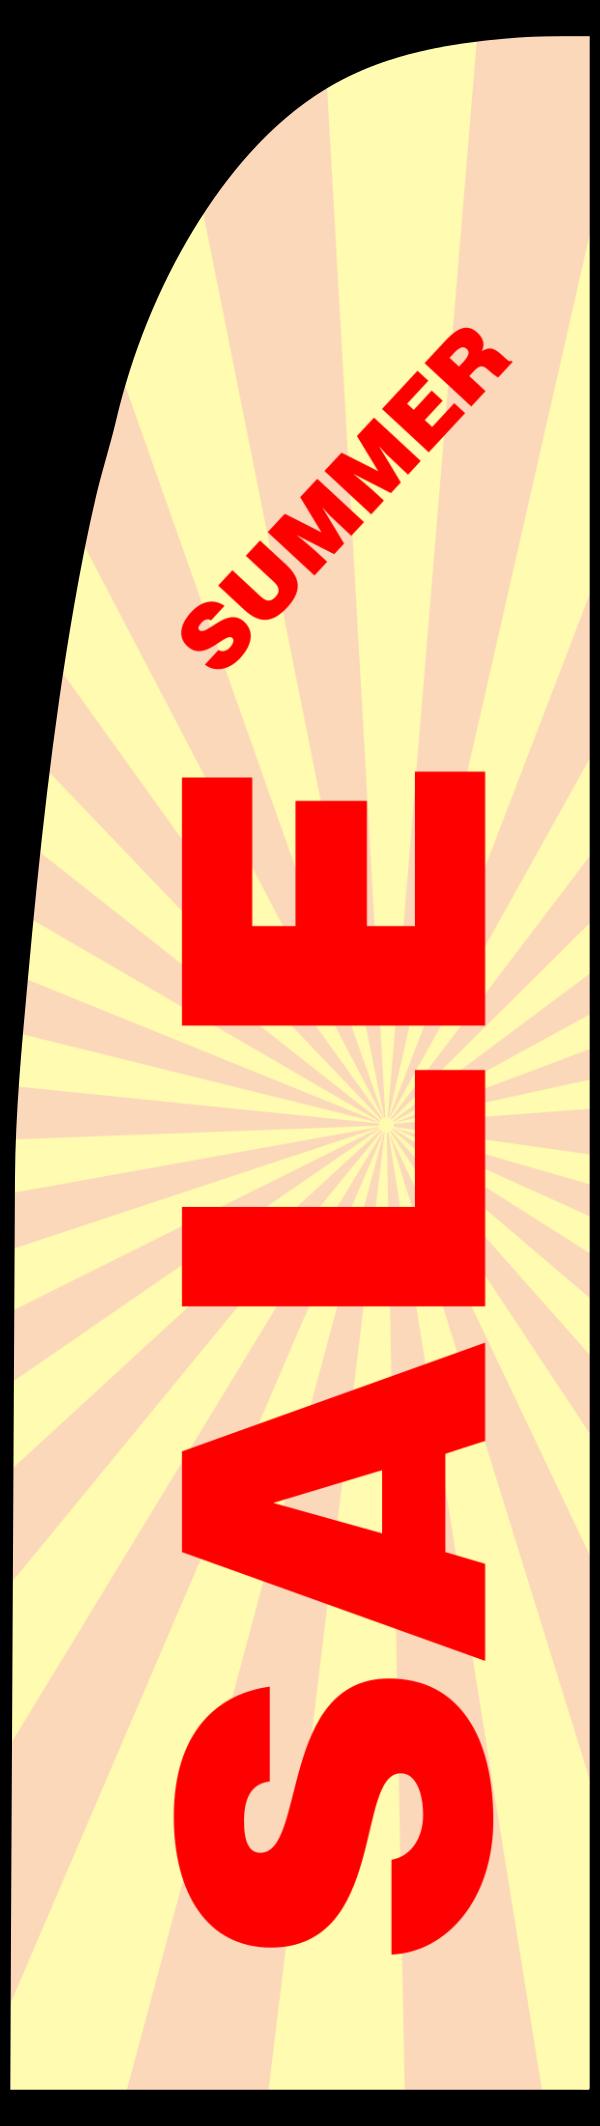 Summer_sale_Flag - design template - 269